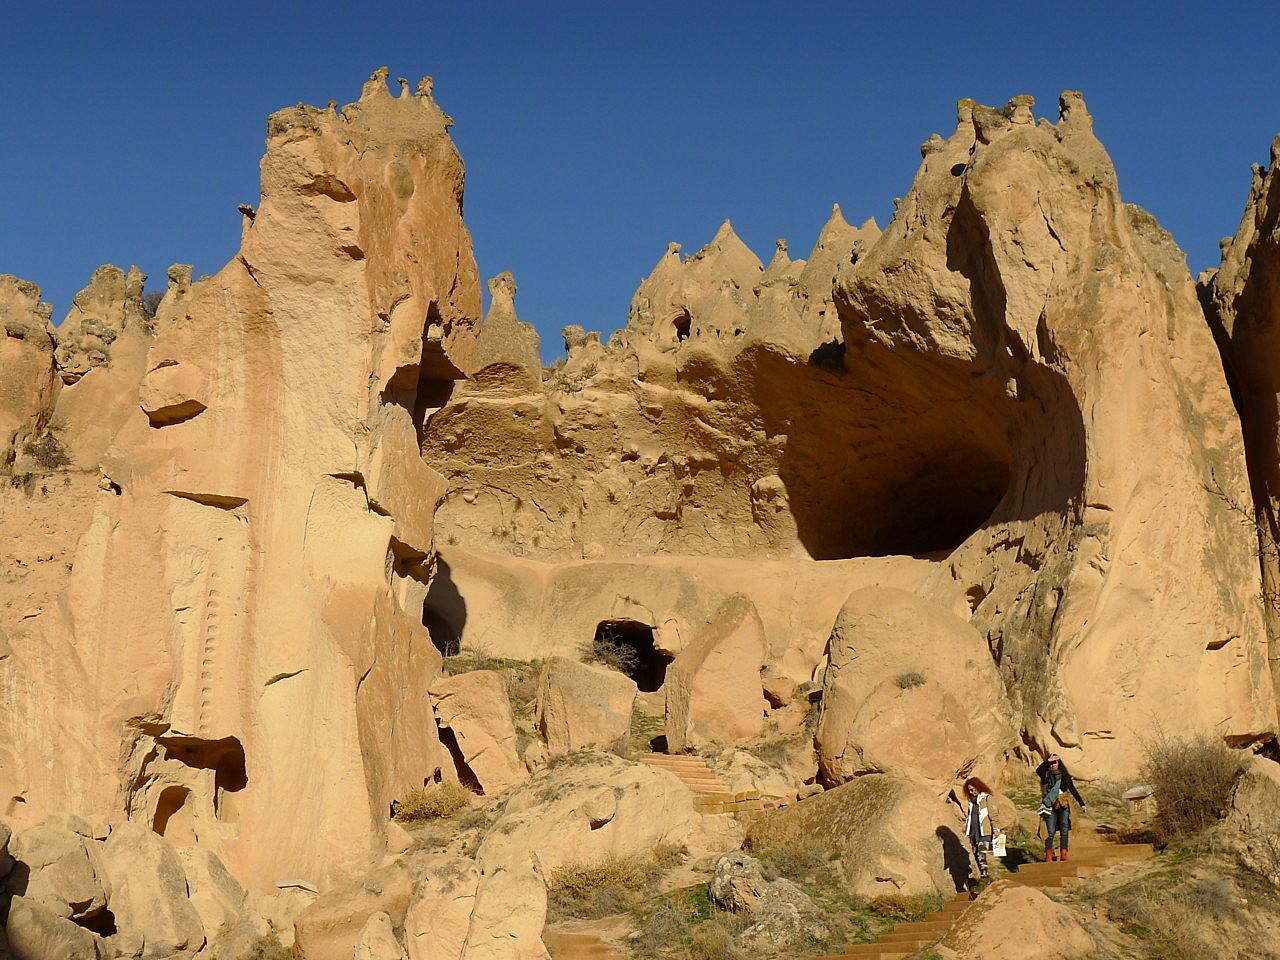 Cavusin Village and Zelve in Cappadocia Turkey